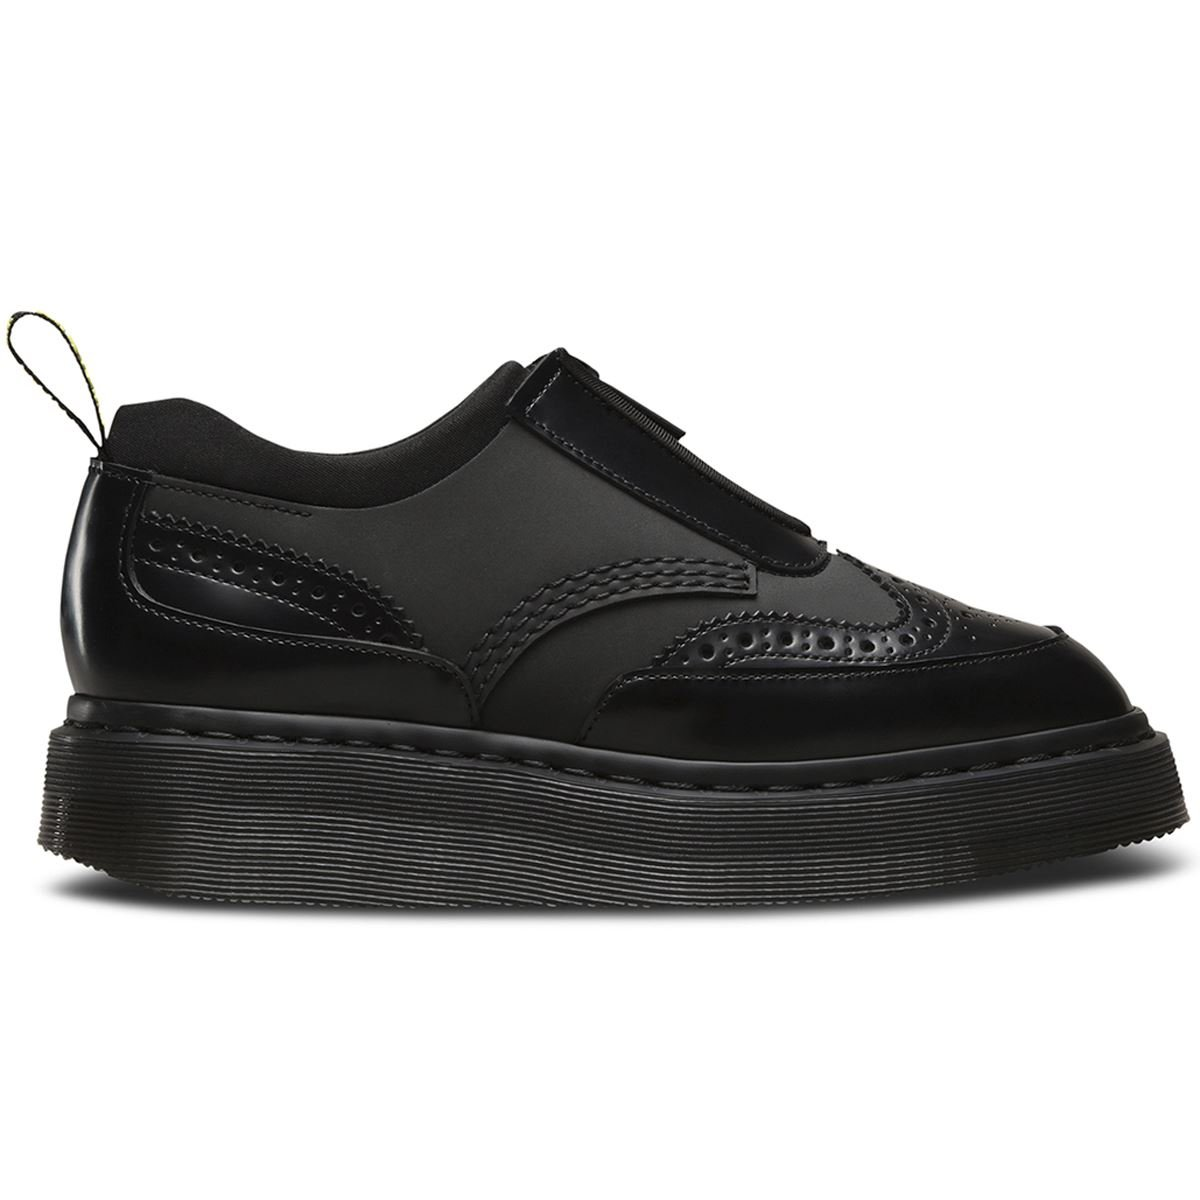 Dr. Martens Women's Resnik Zip Brogue Oxfords, Black, Leather, Neoprene, Rubber, 4 M UK, 6 M US